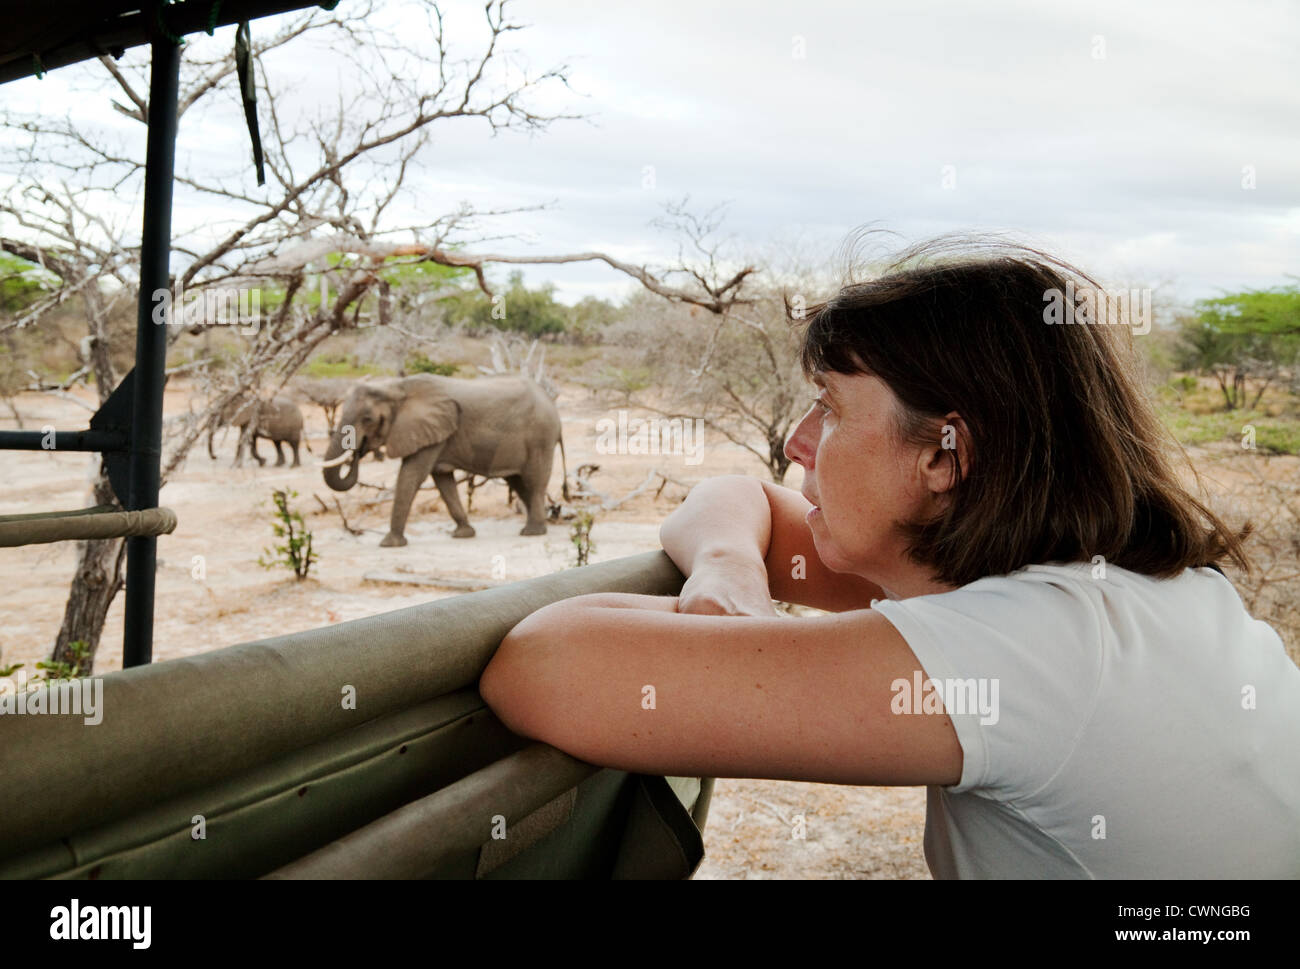 Tanzania safari - A tourist watching elephants from a jeep safari, Selous Game Reserve Tanzania Africa - Stock Image